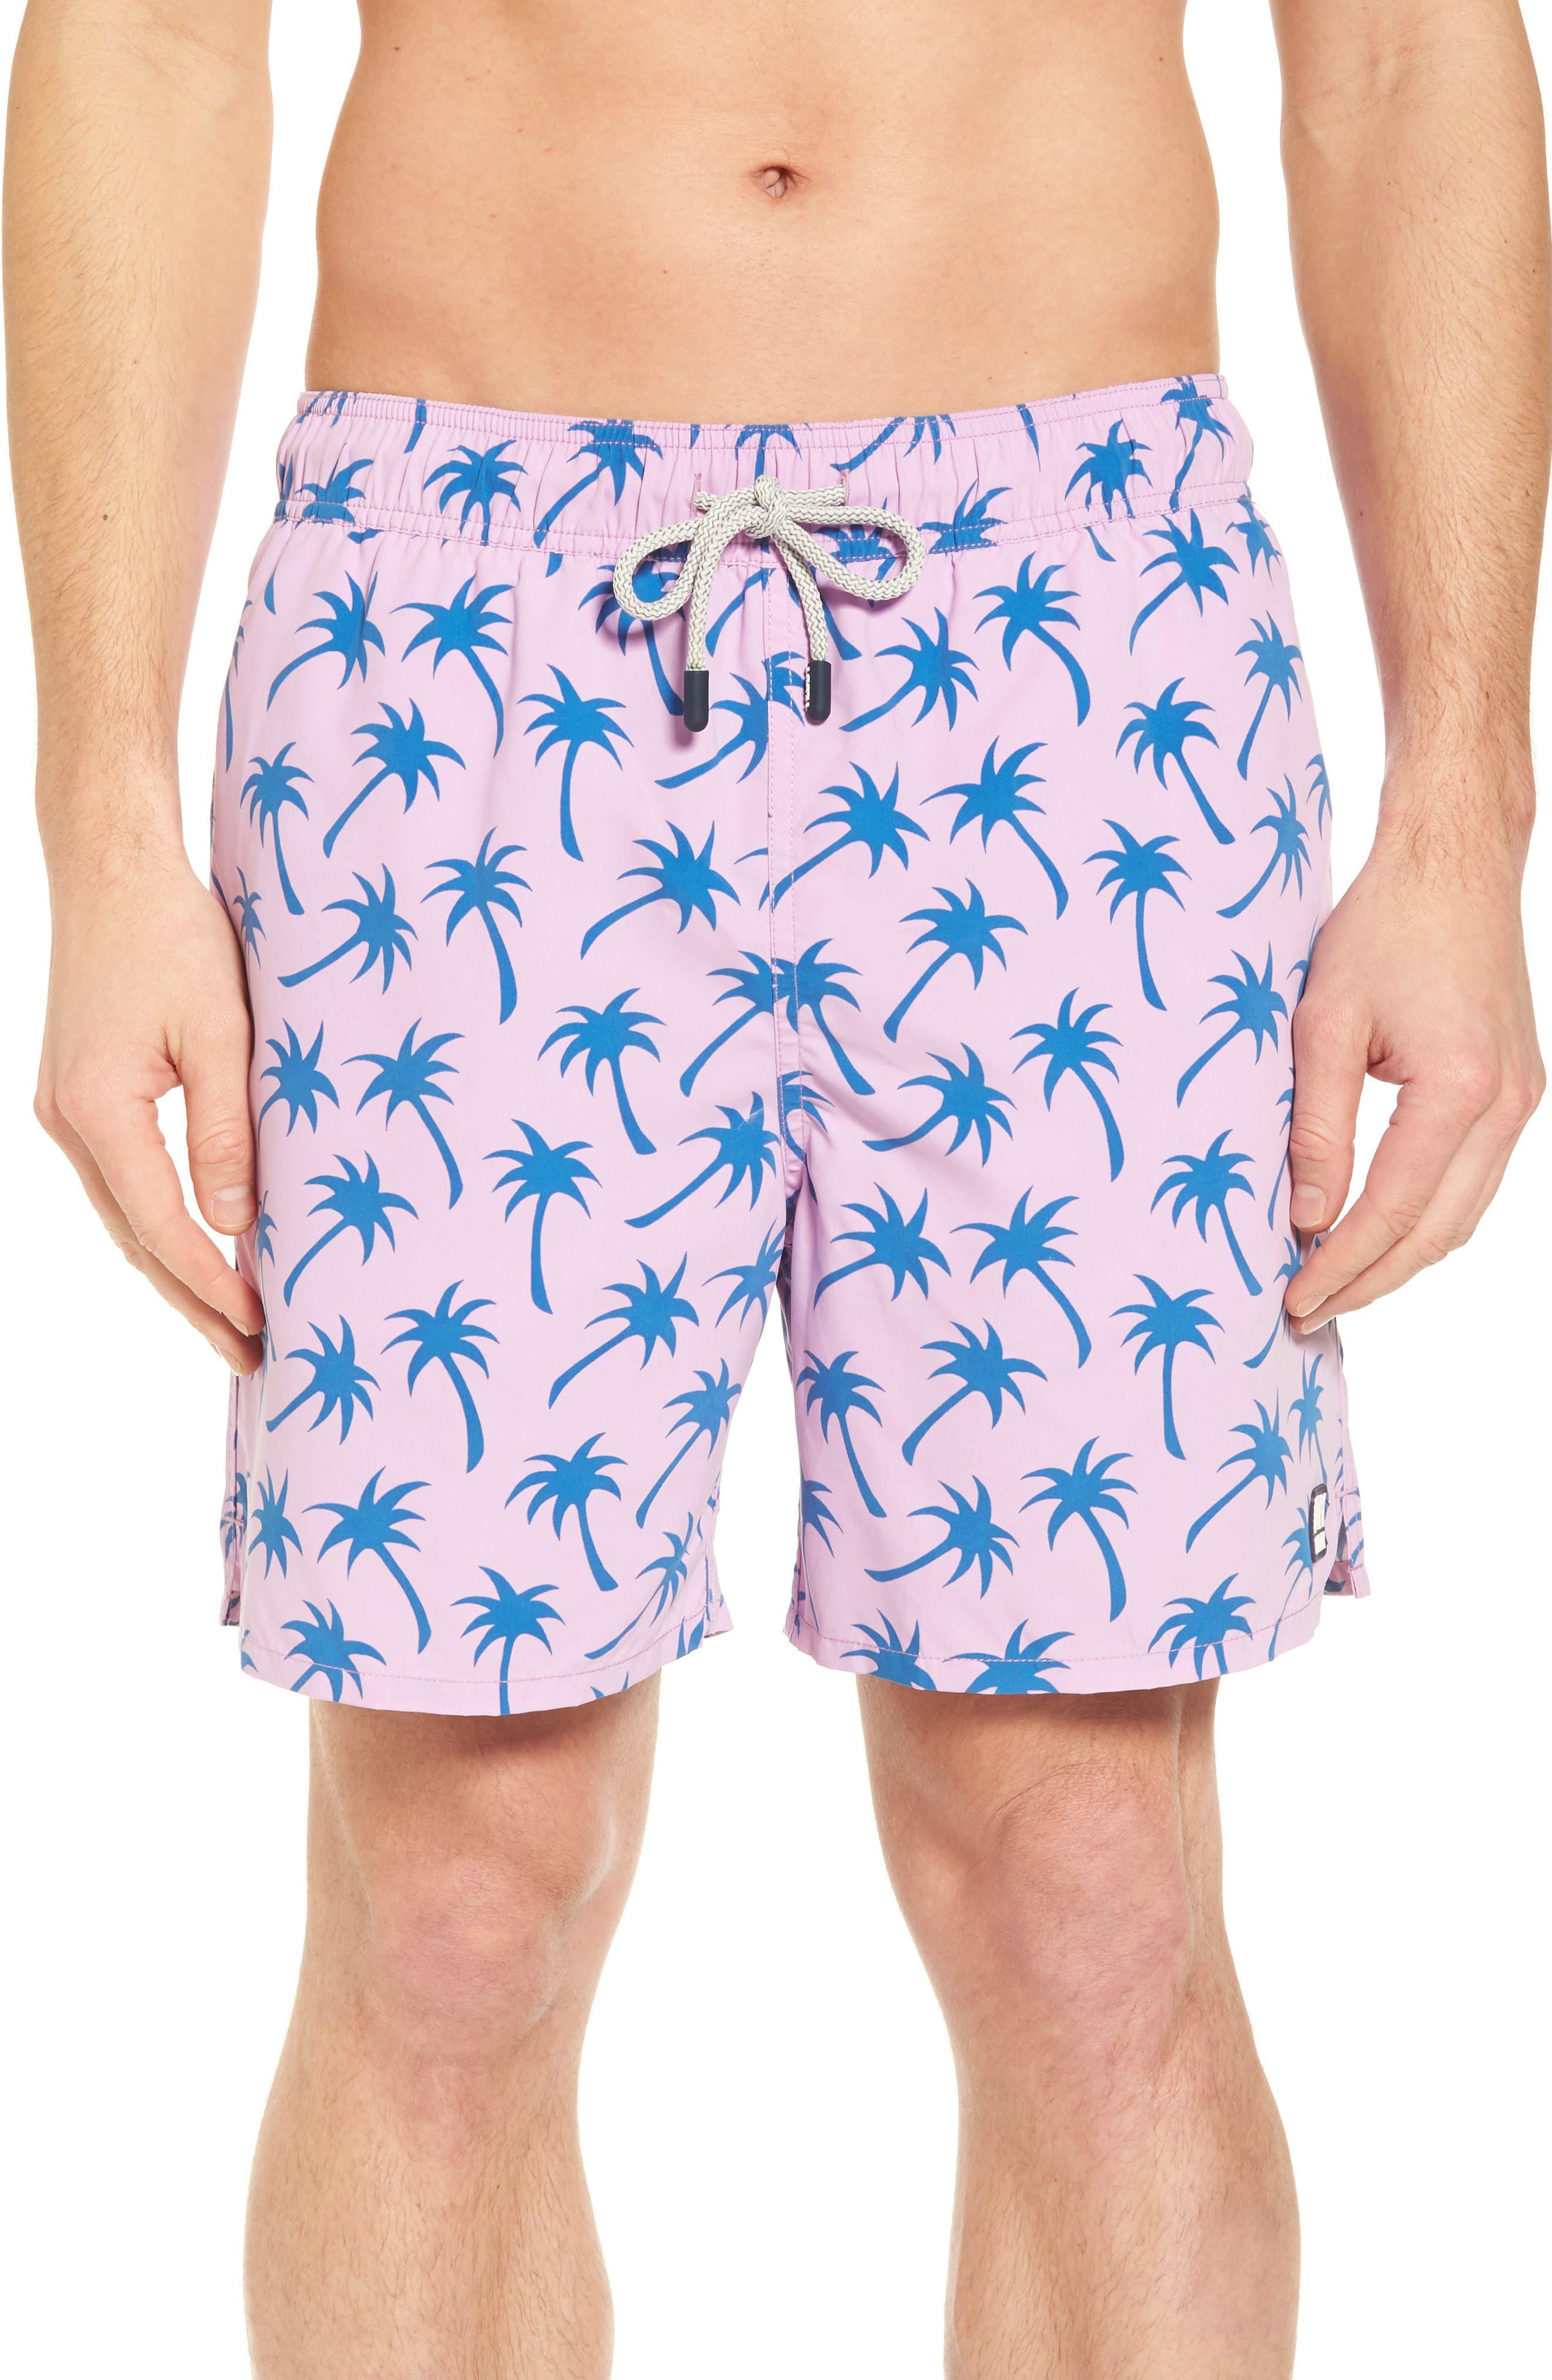 Palm Print Swim Trunks,                         Main,                         color, Lavender / Blue